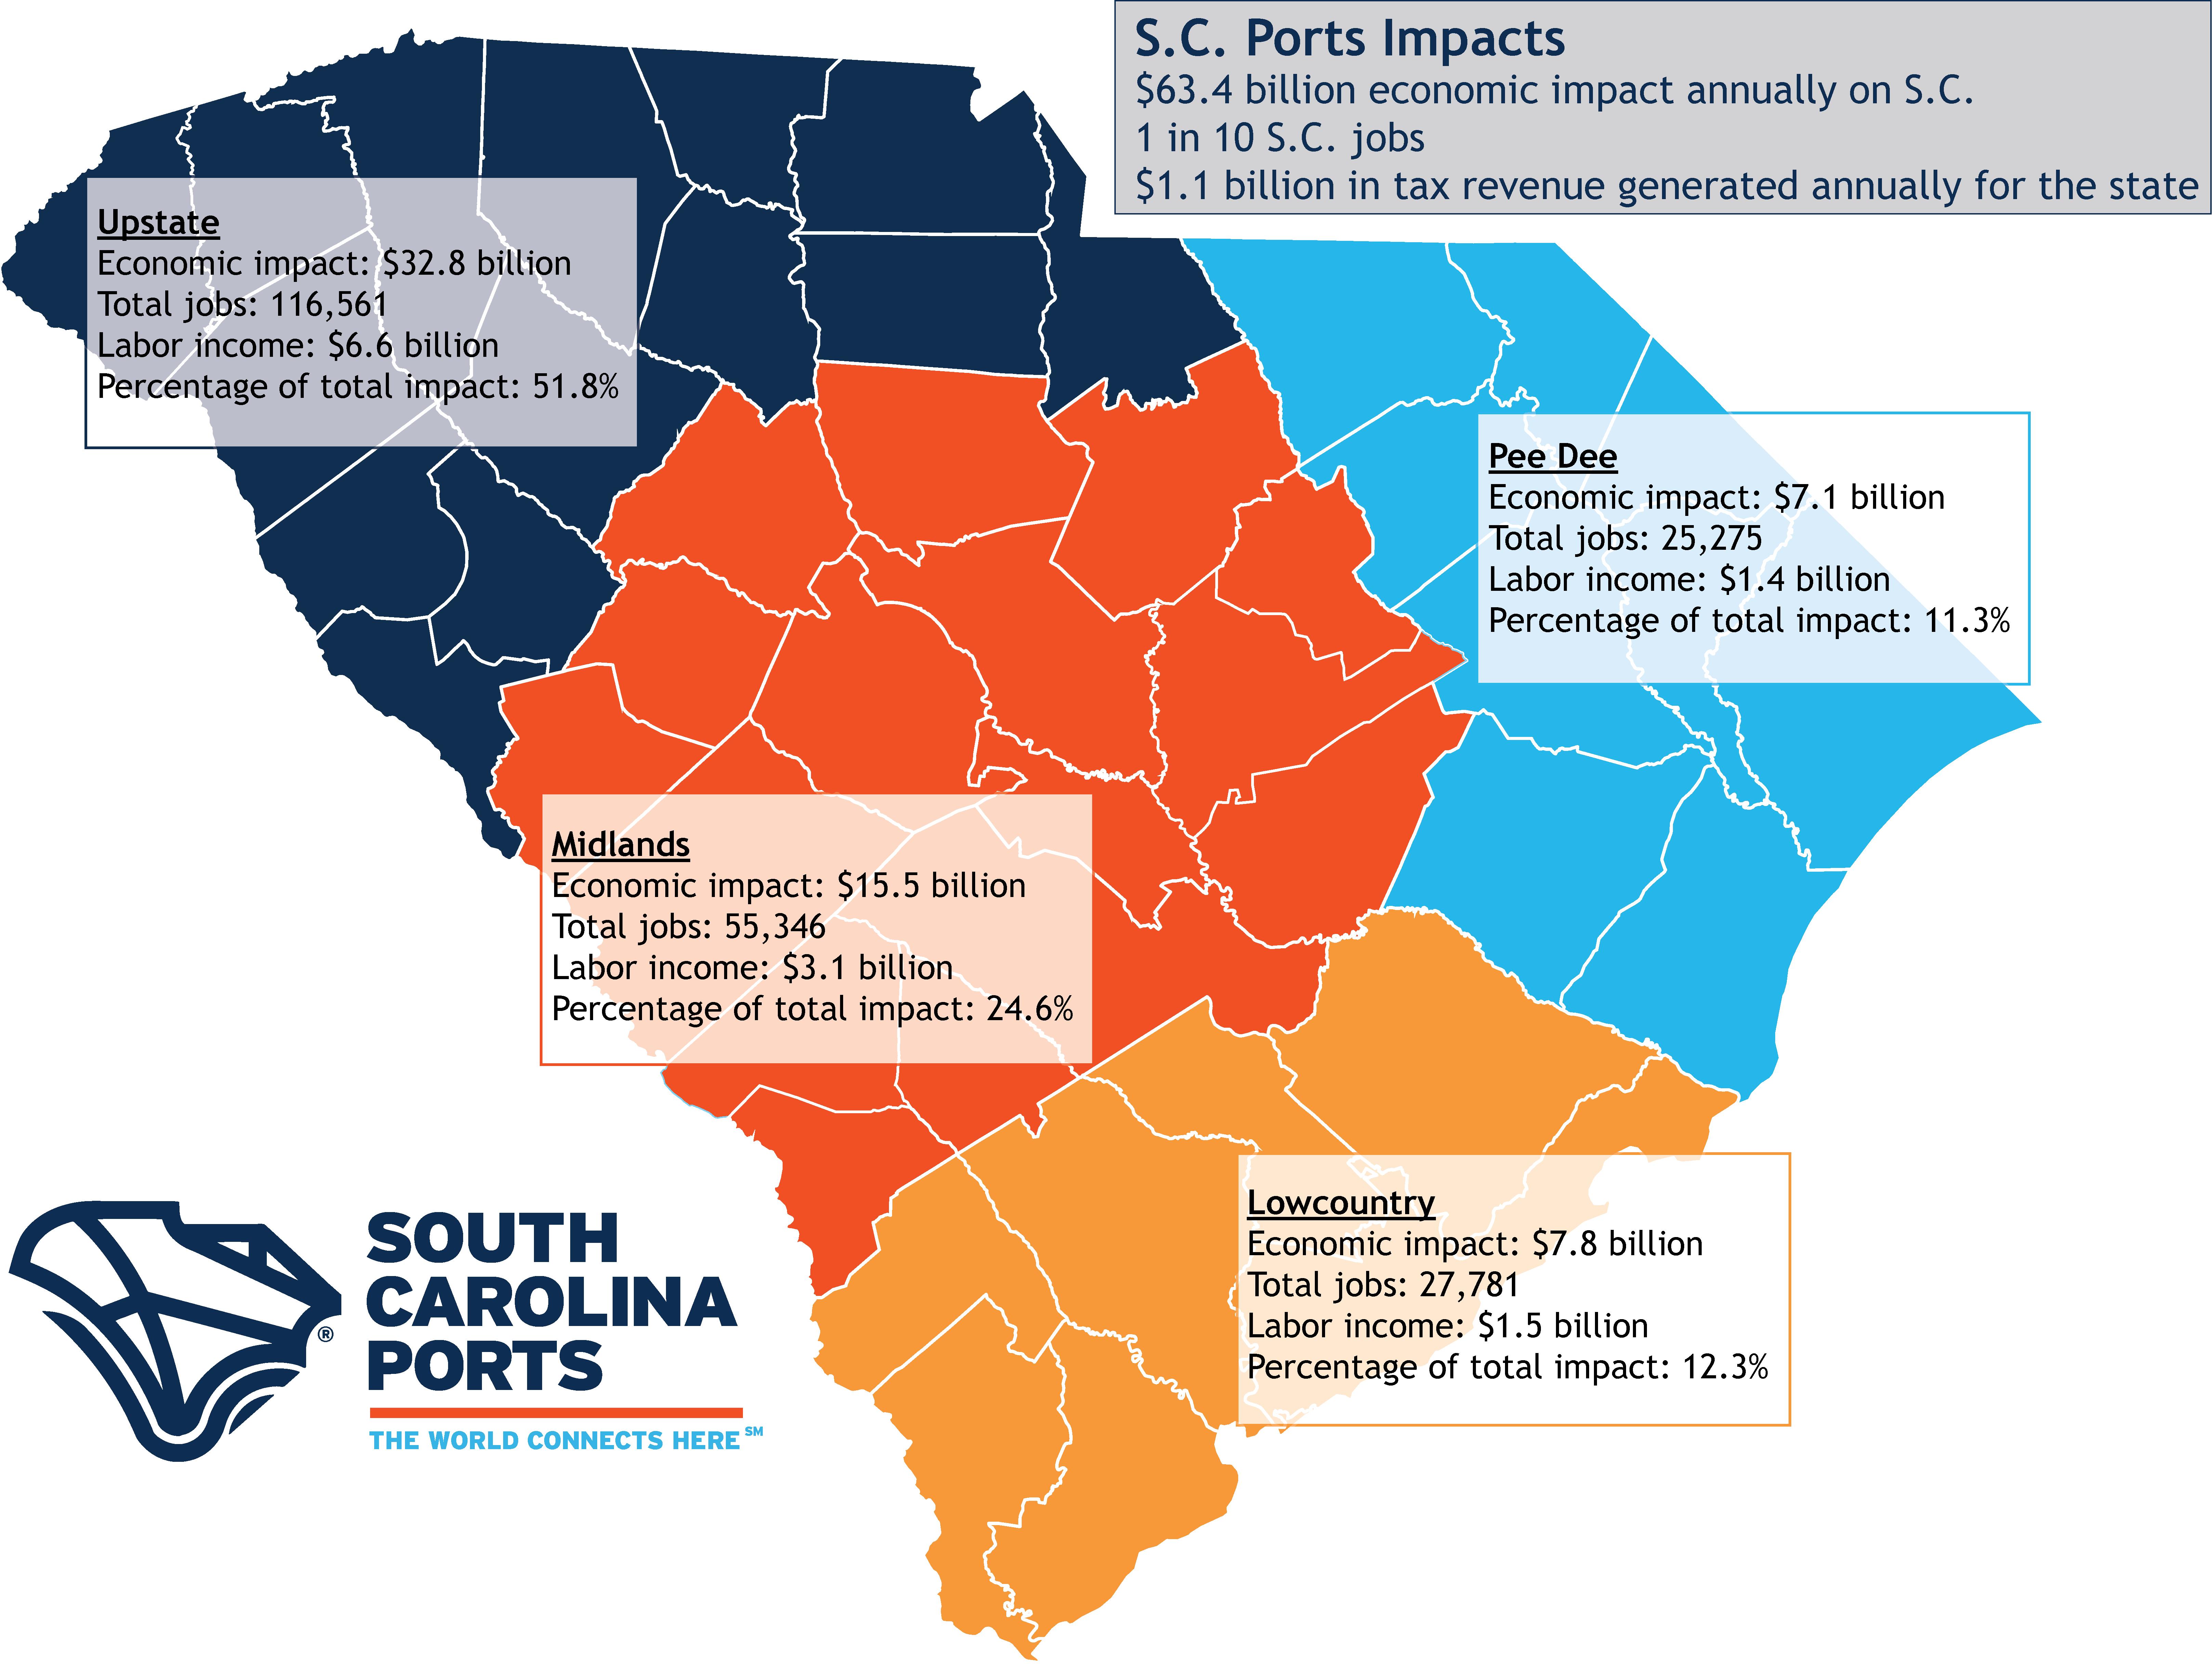 Economic Impact Map Image